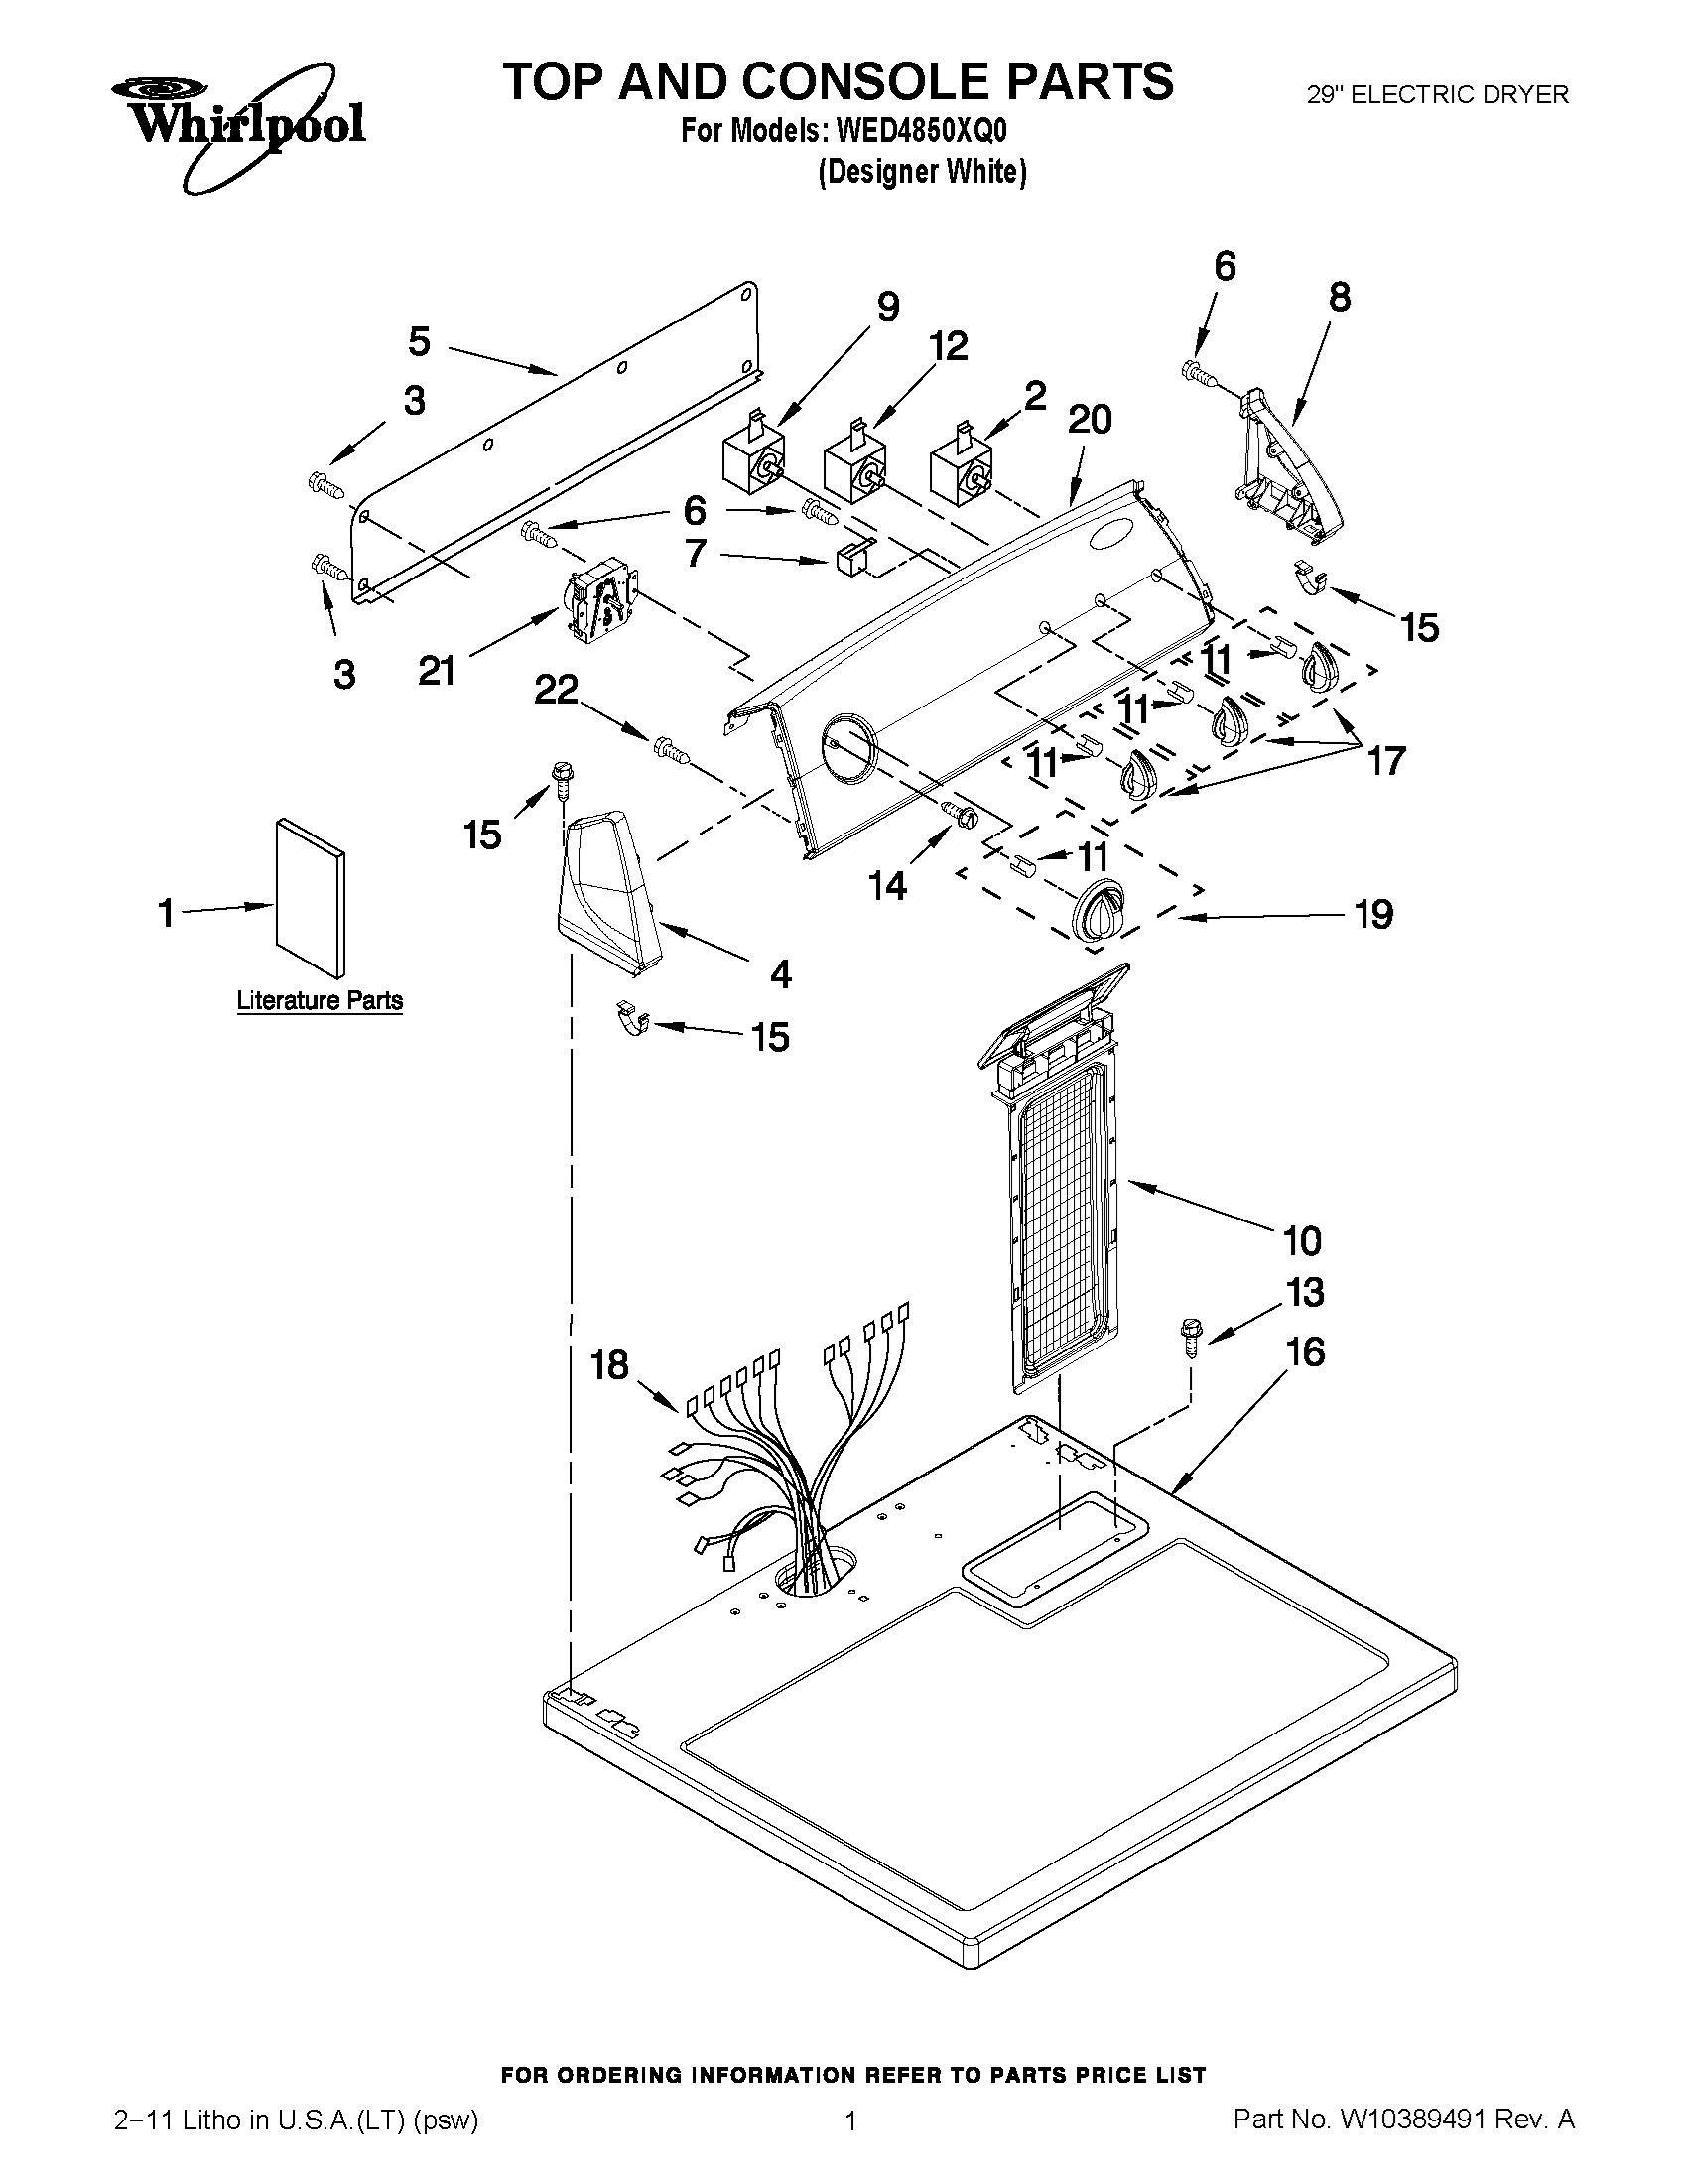 WhirlpoolImg_19000101 20150716_00201795?width\\d1000 whirlpool duet dryer wiring diagram efcaviation com boss bv9555 wiring harness at soozxer.org